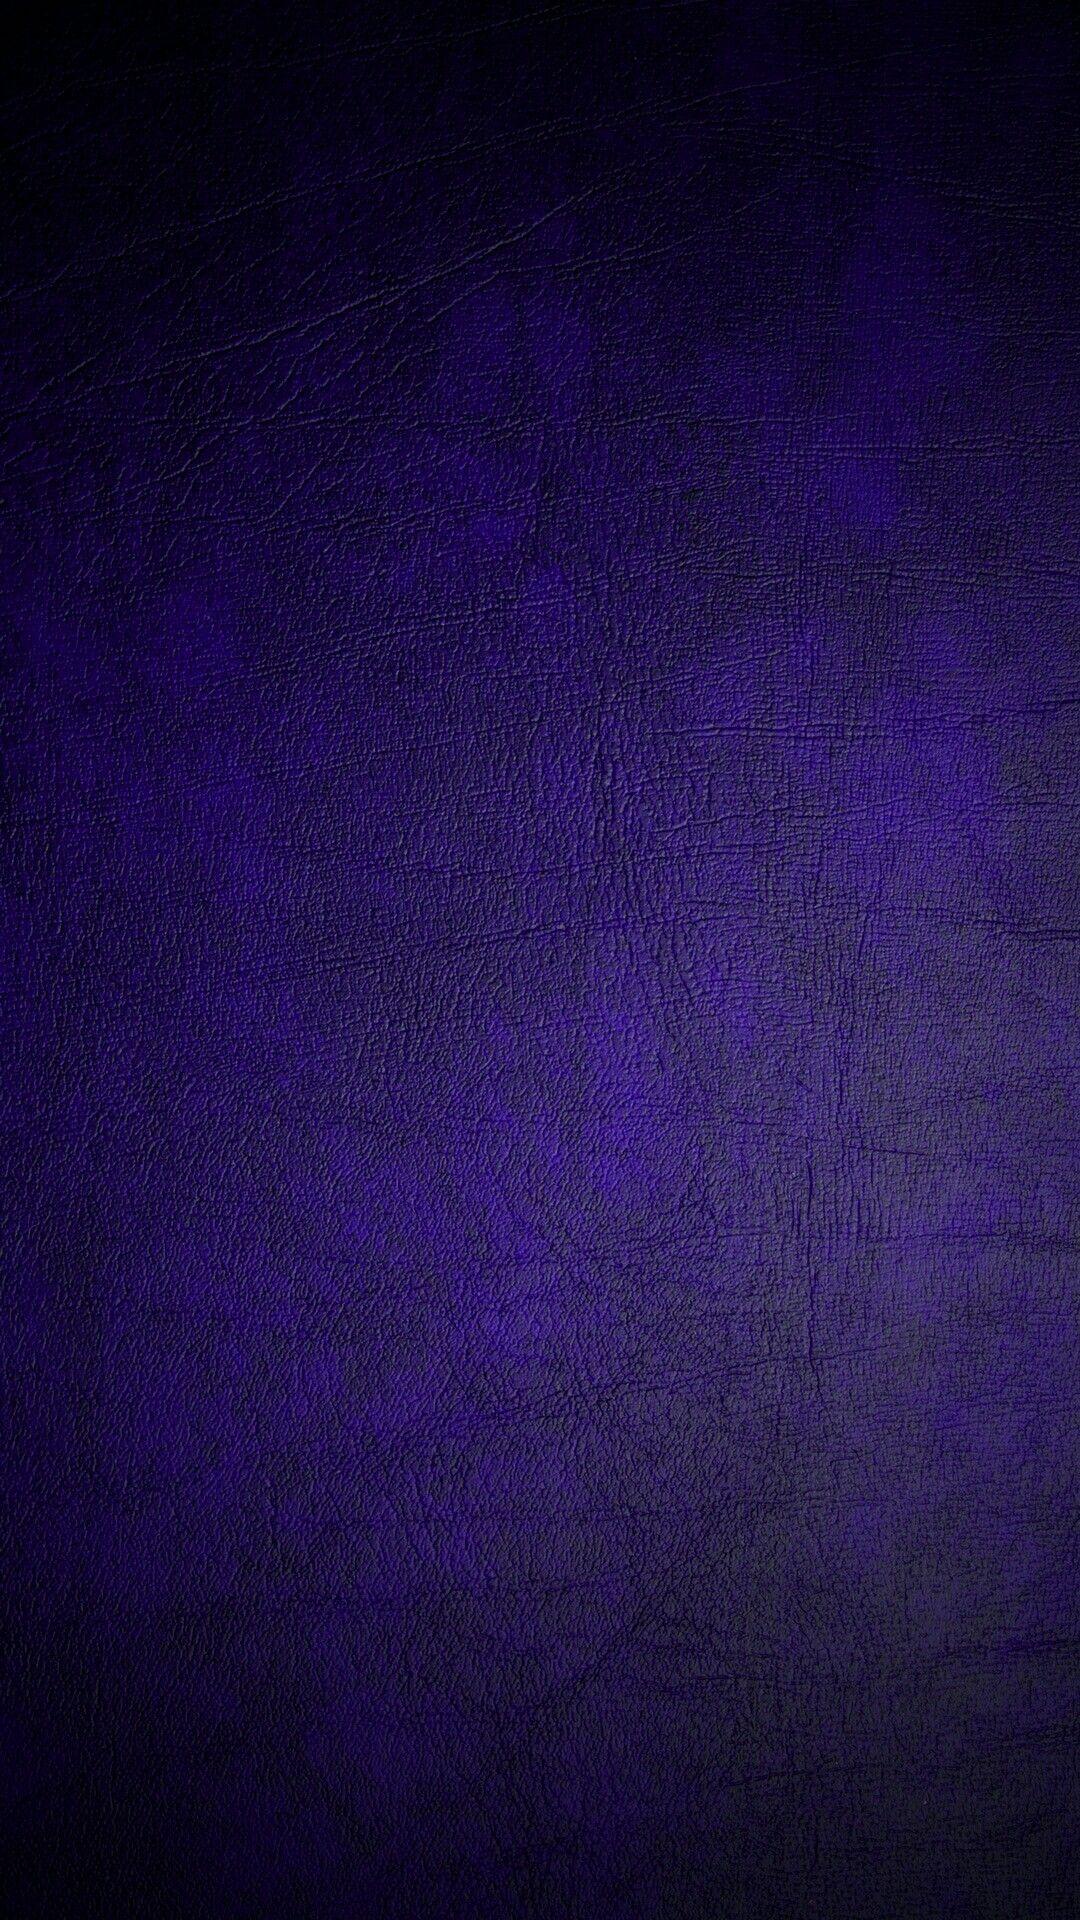 Pin By Muchatseble On Wallpaper Purple Wallpaper Iphone Purple Wallpaper Background Images Wallpapers